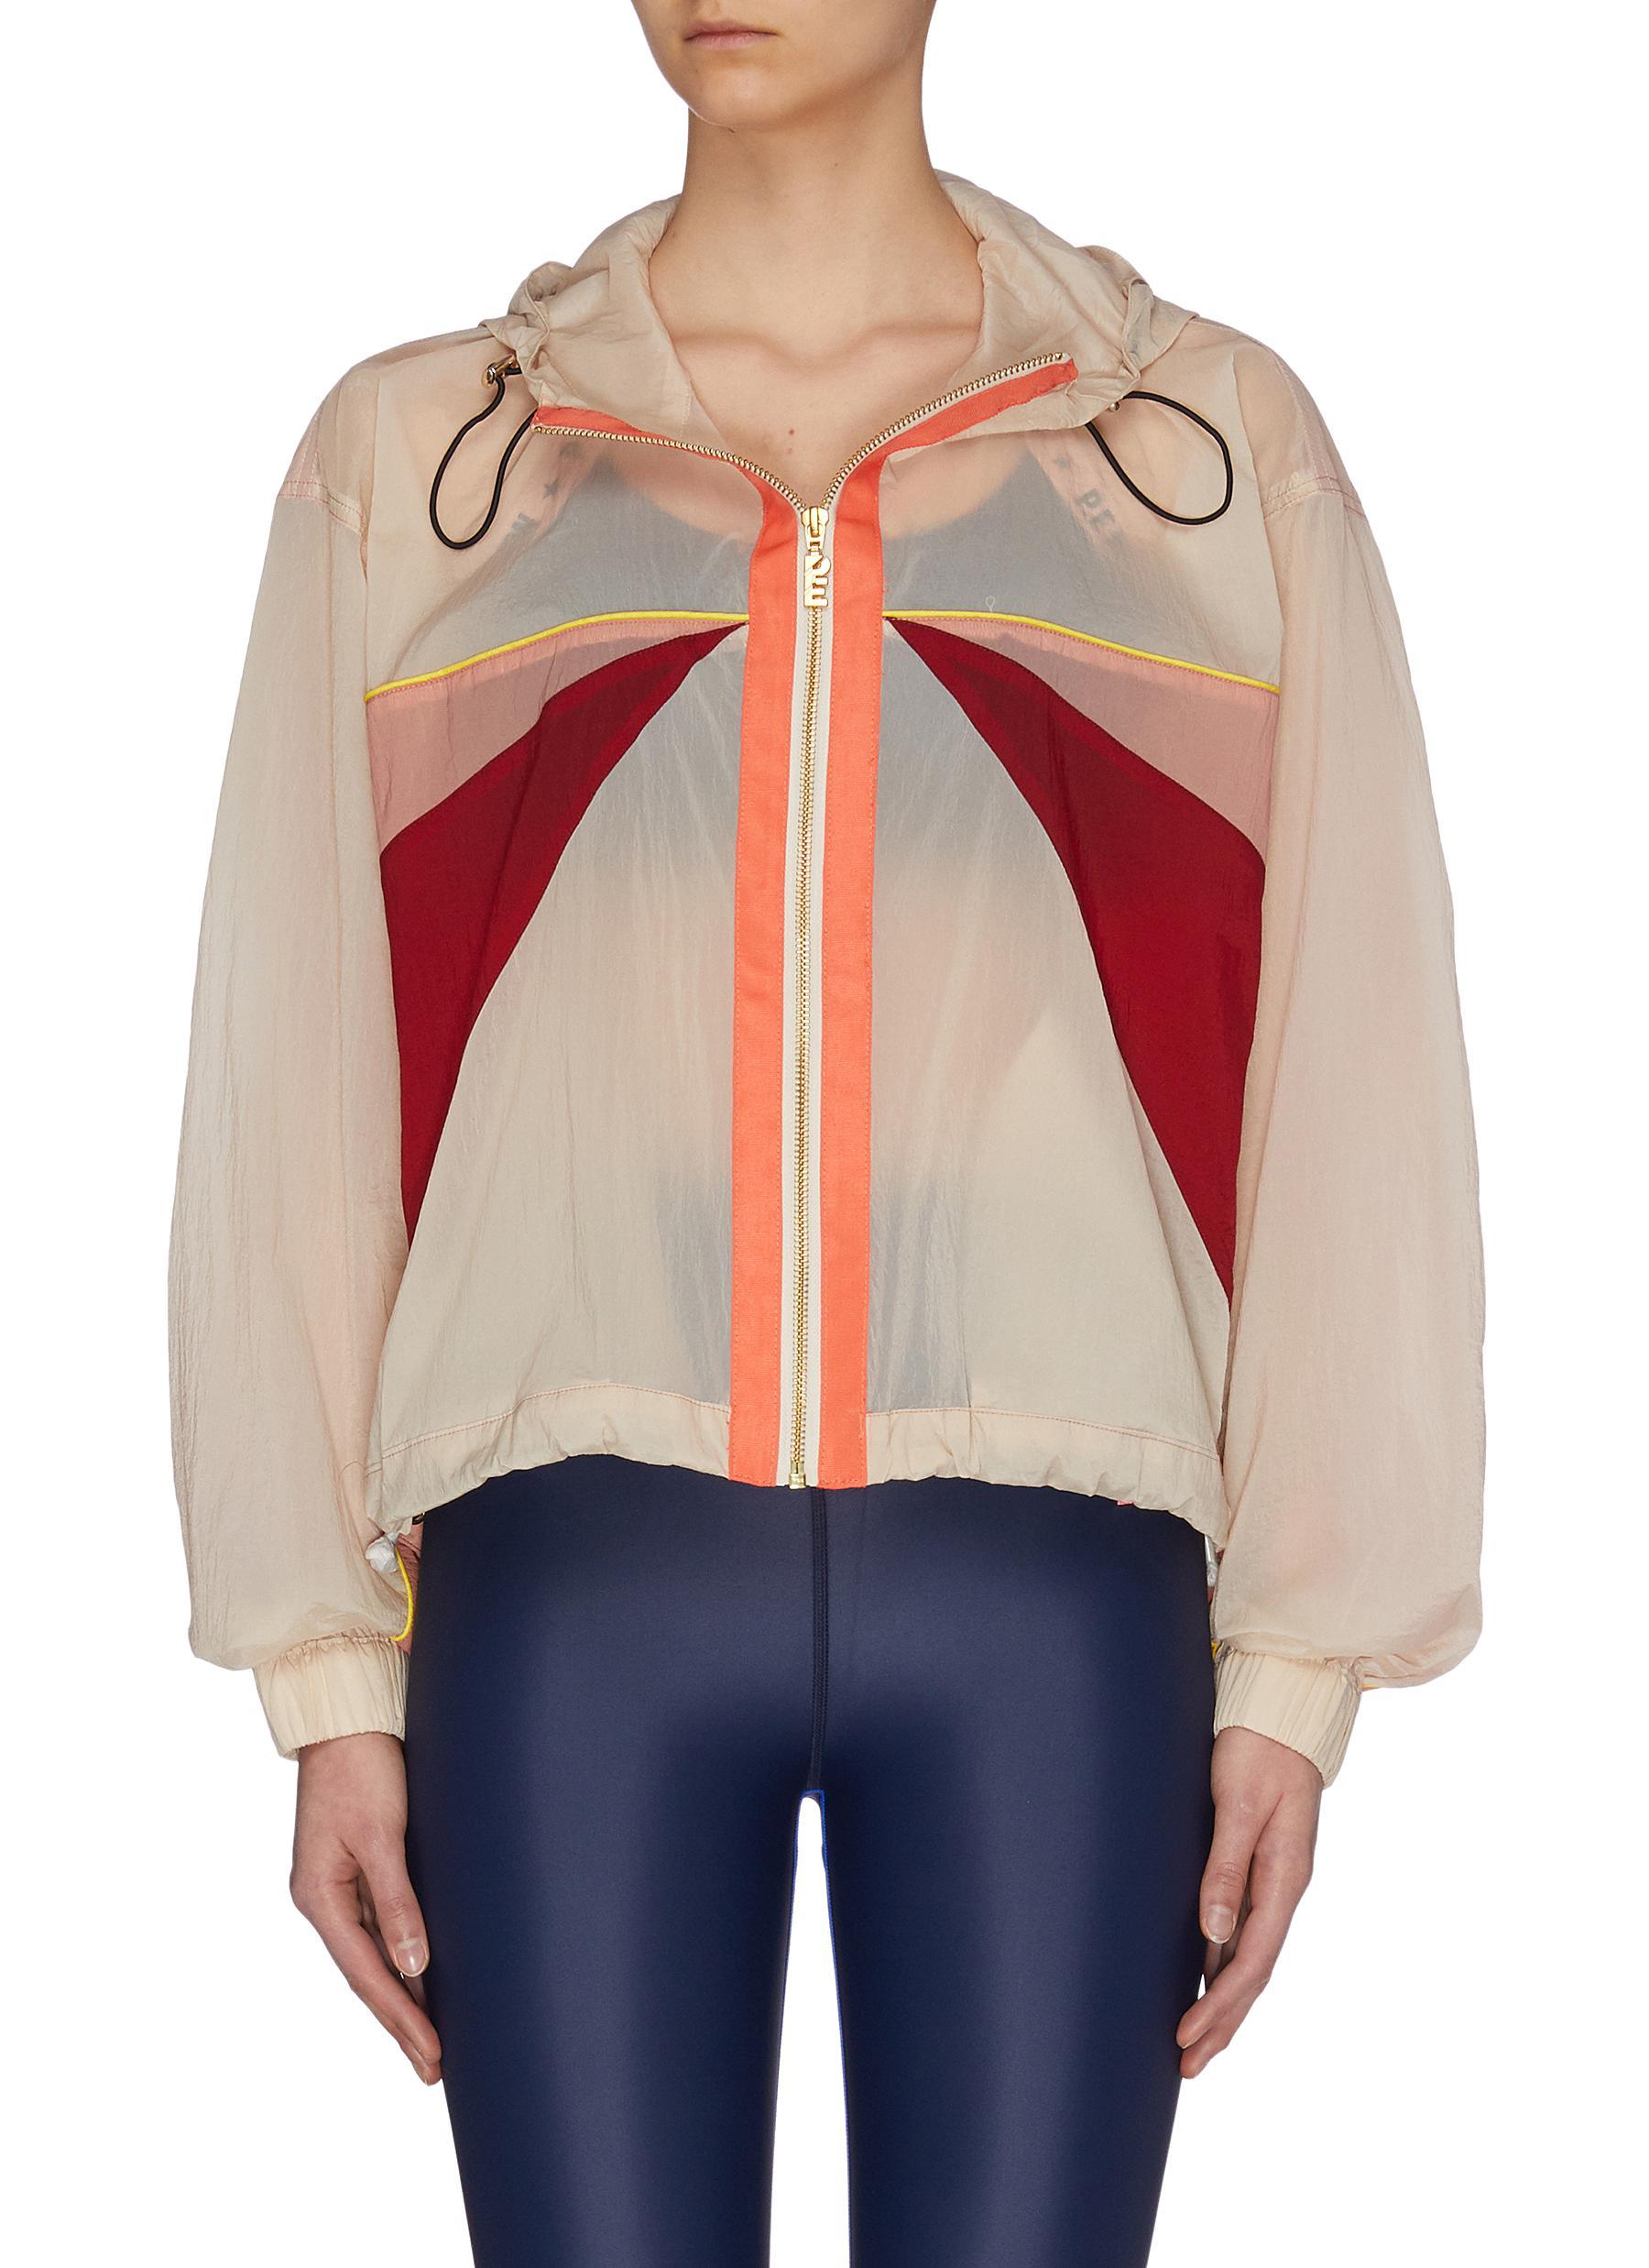 Buy P.E Nation Jackets 'Extend' contrast panel performance jacket